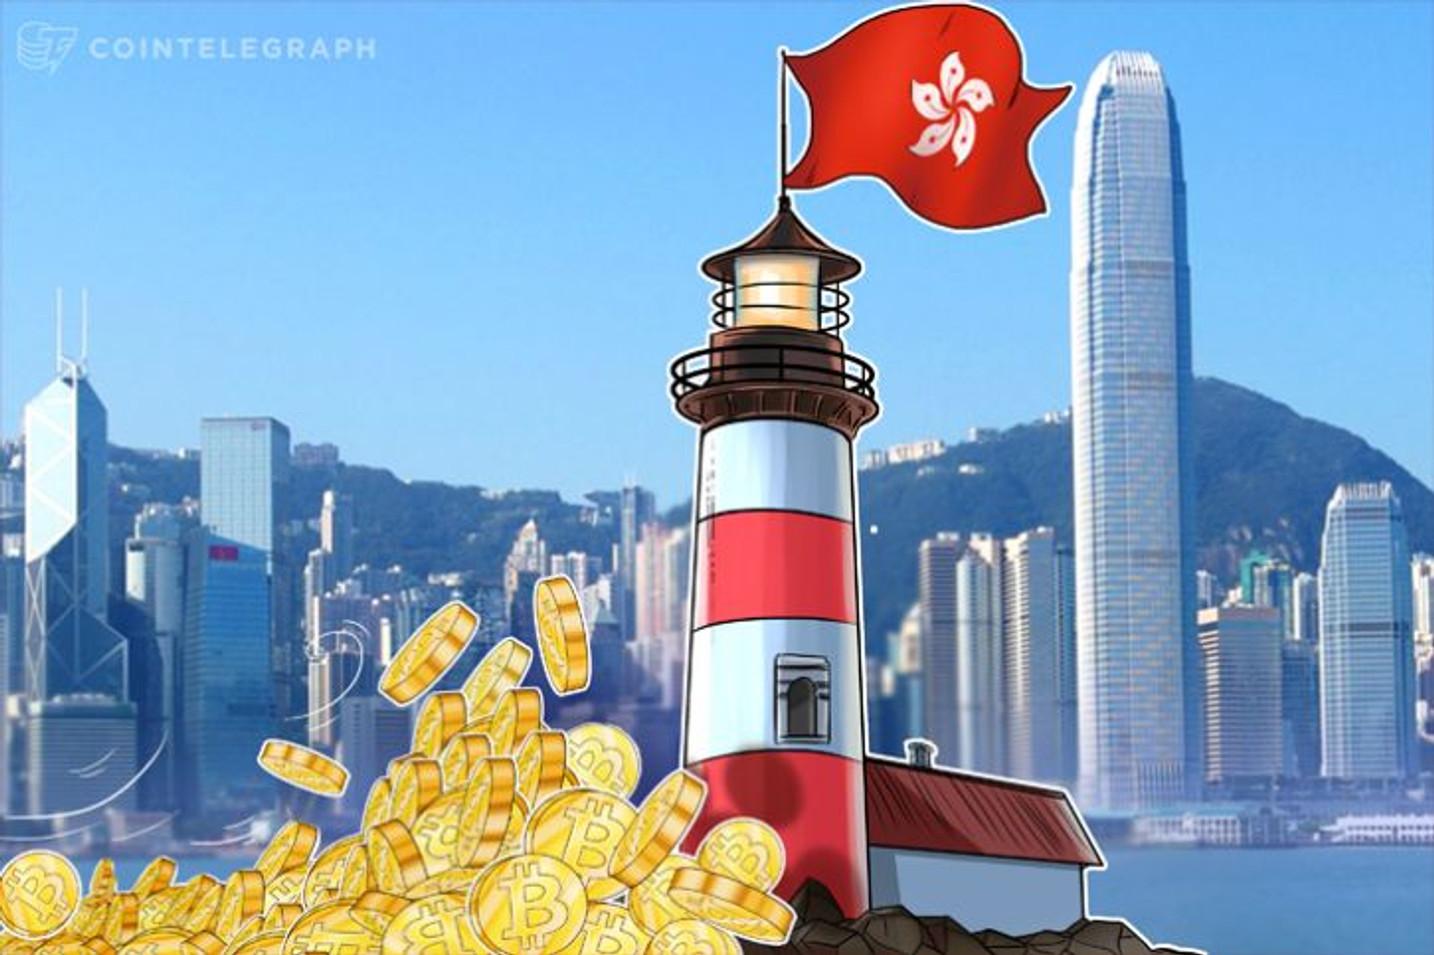 Hong Kong obuzet kriptomanijom; ICO groznica opstaje uprkos kineskoj zabrani!